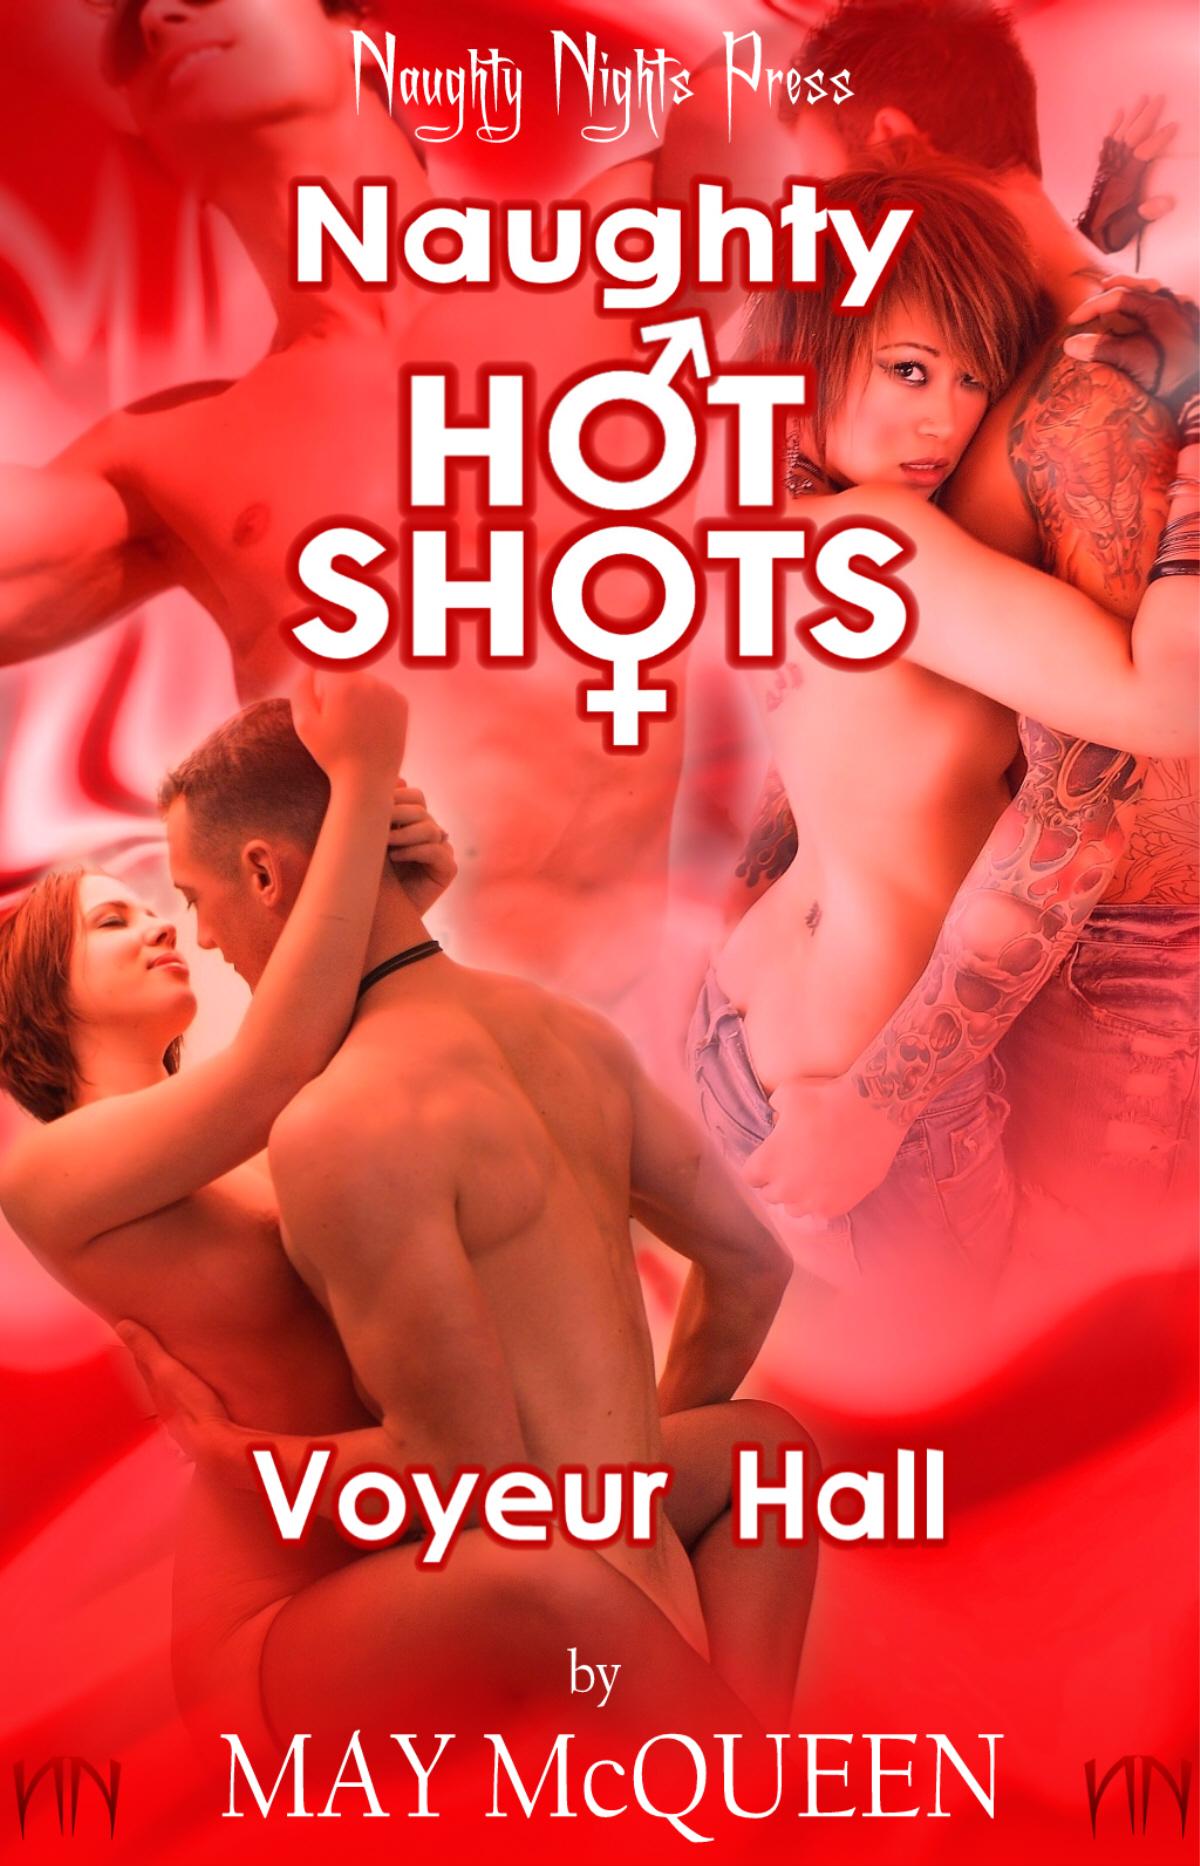 May McQueen - Naughty Hot Shots - Voyeur Hall